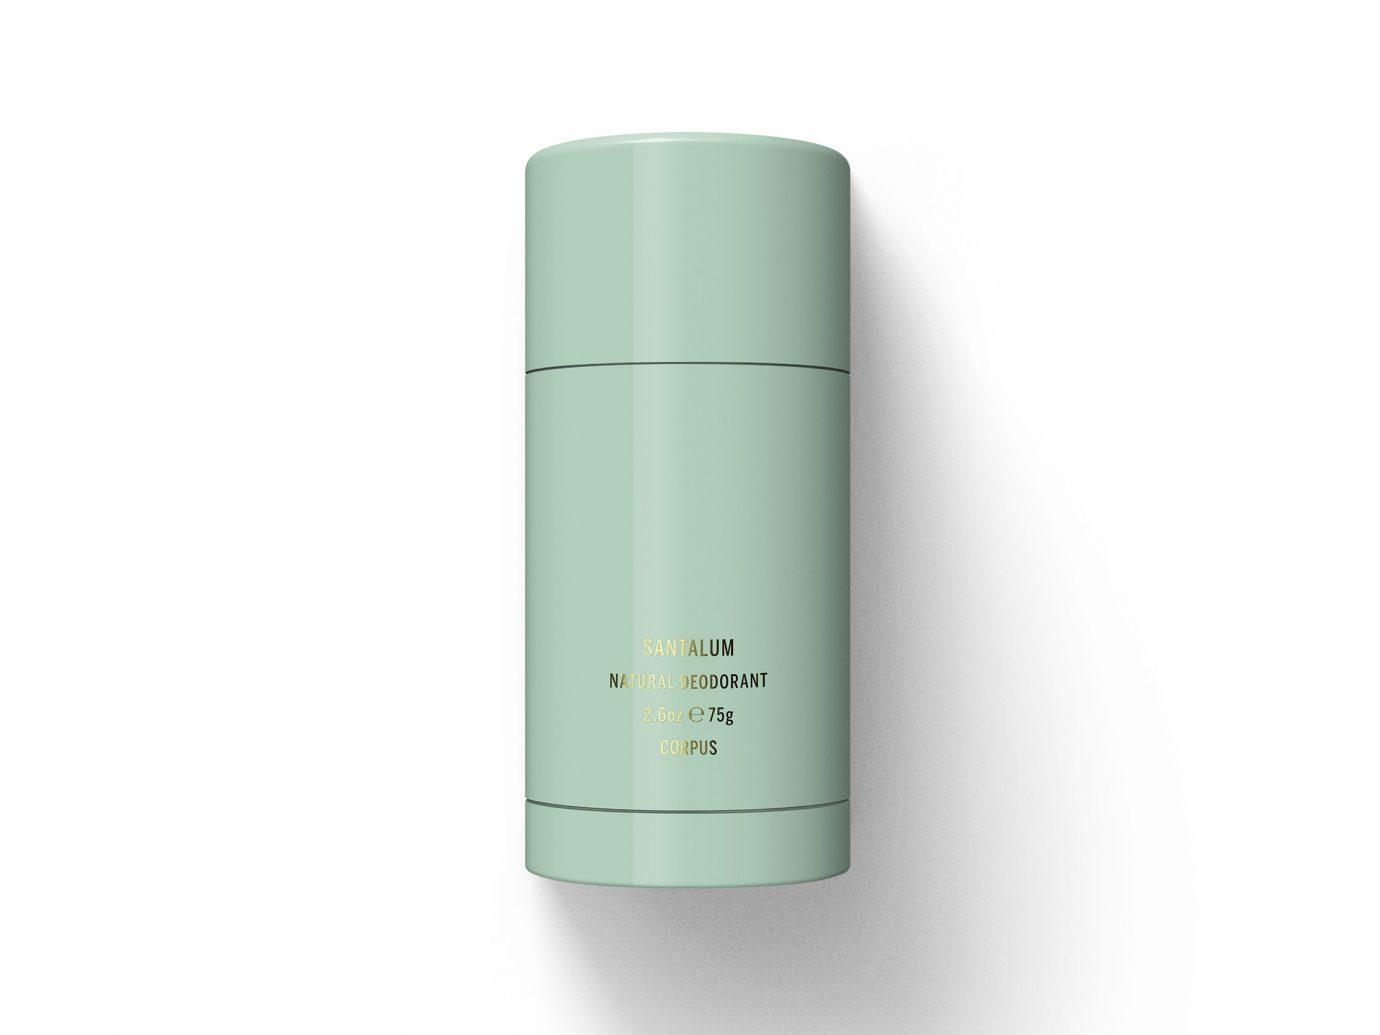 Corpus Natural Deodorant: Santalum